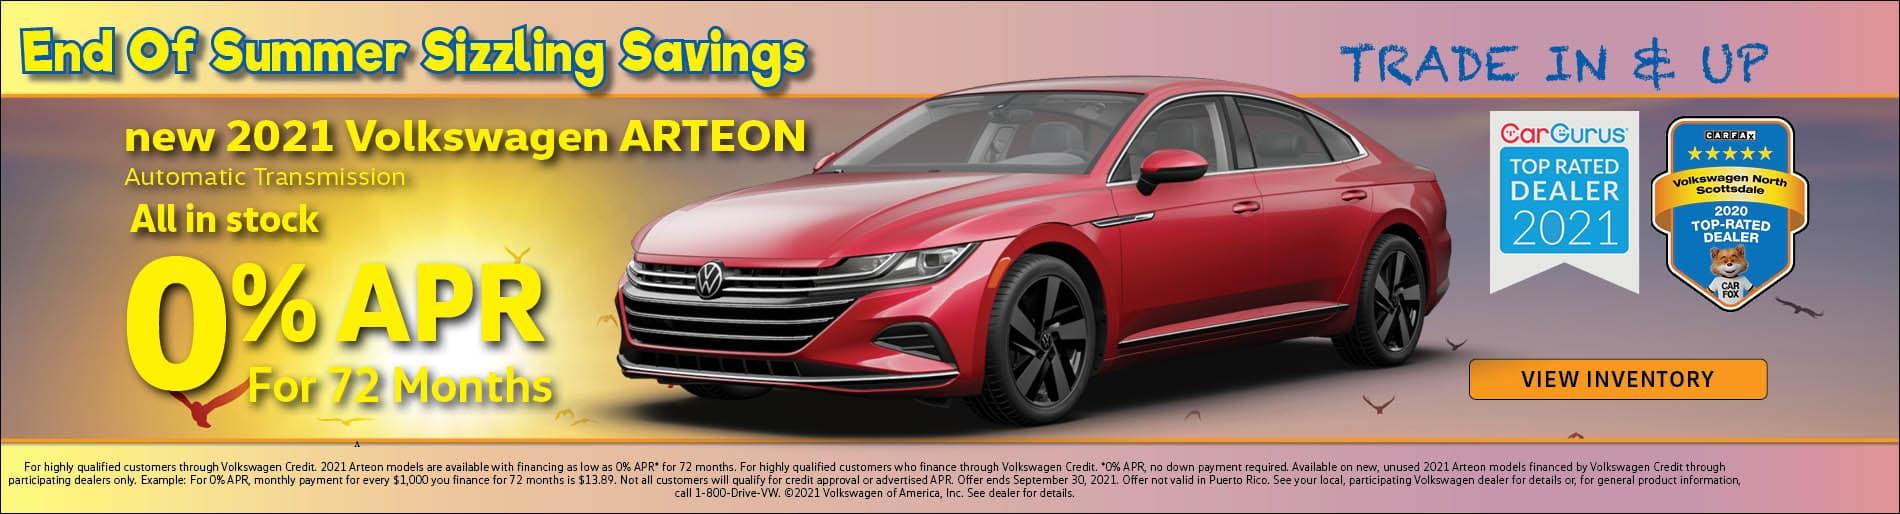 2021 VW Arteon - 0% APR for 72 months